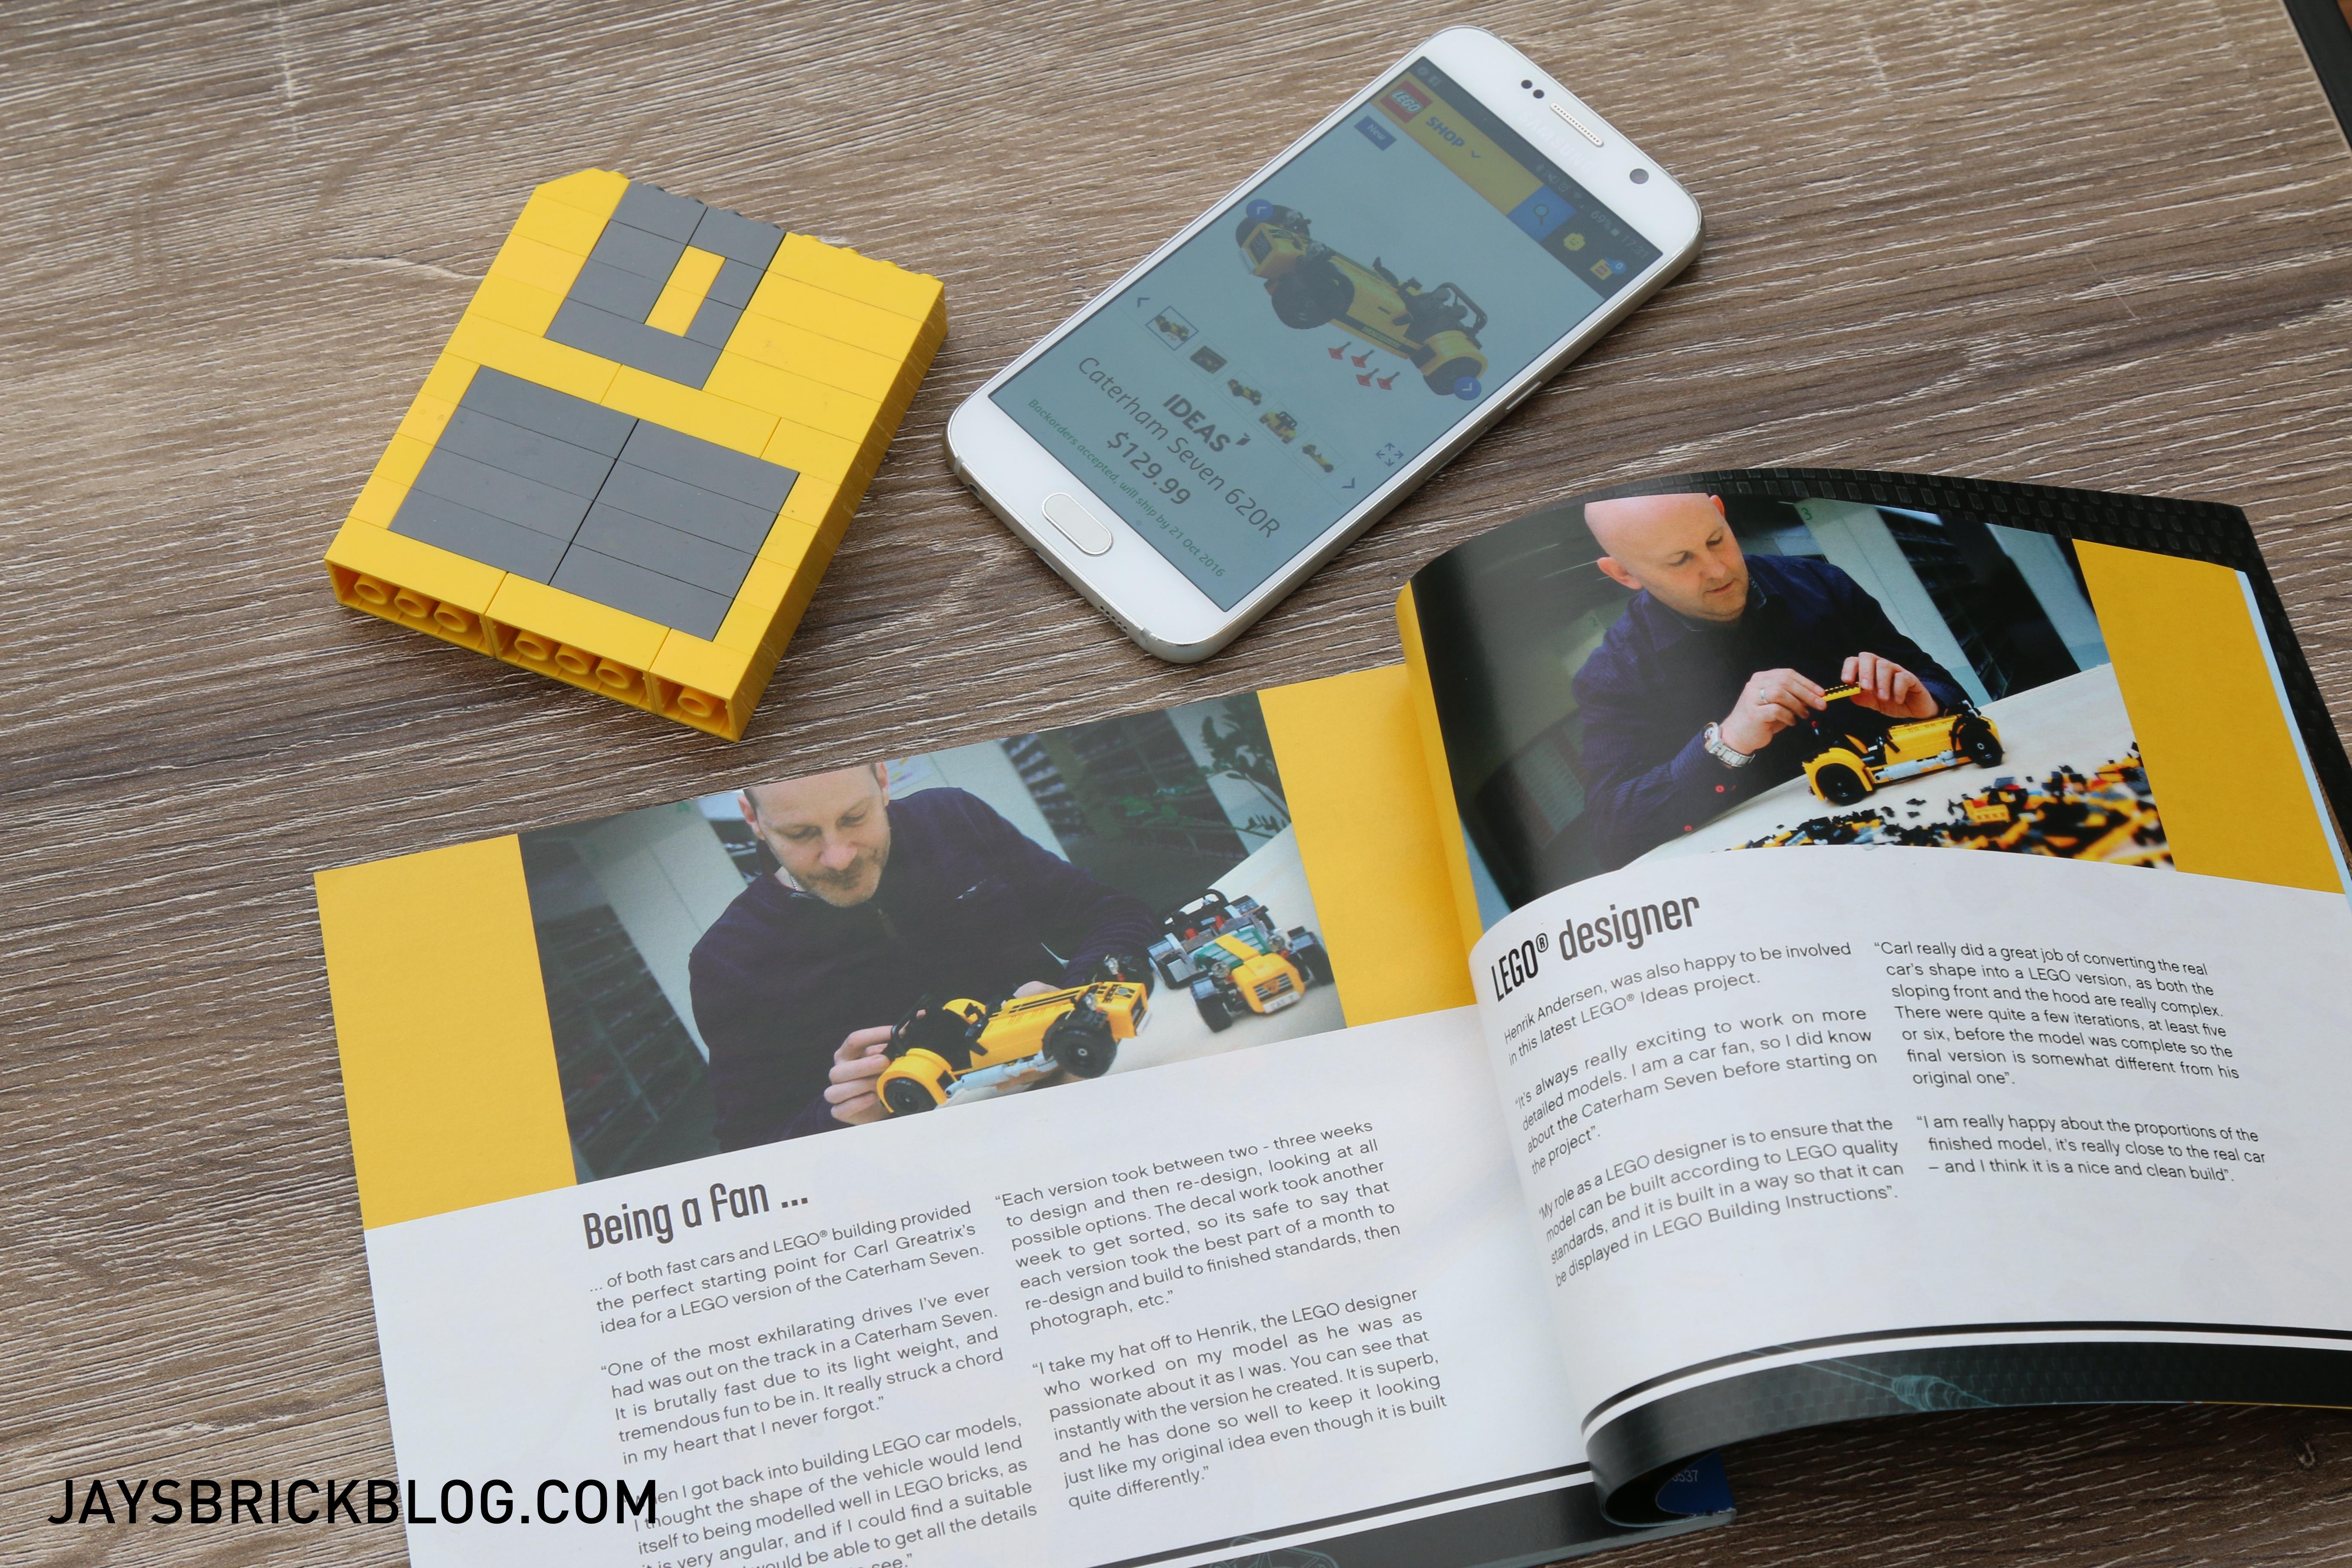 lego-21307-caterham-seven-interview-with-designer